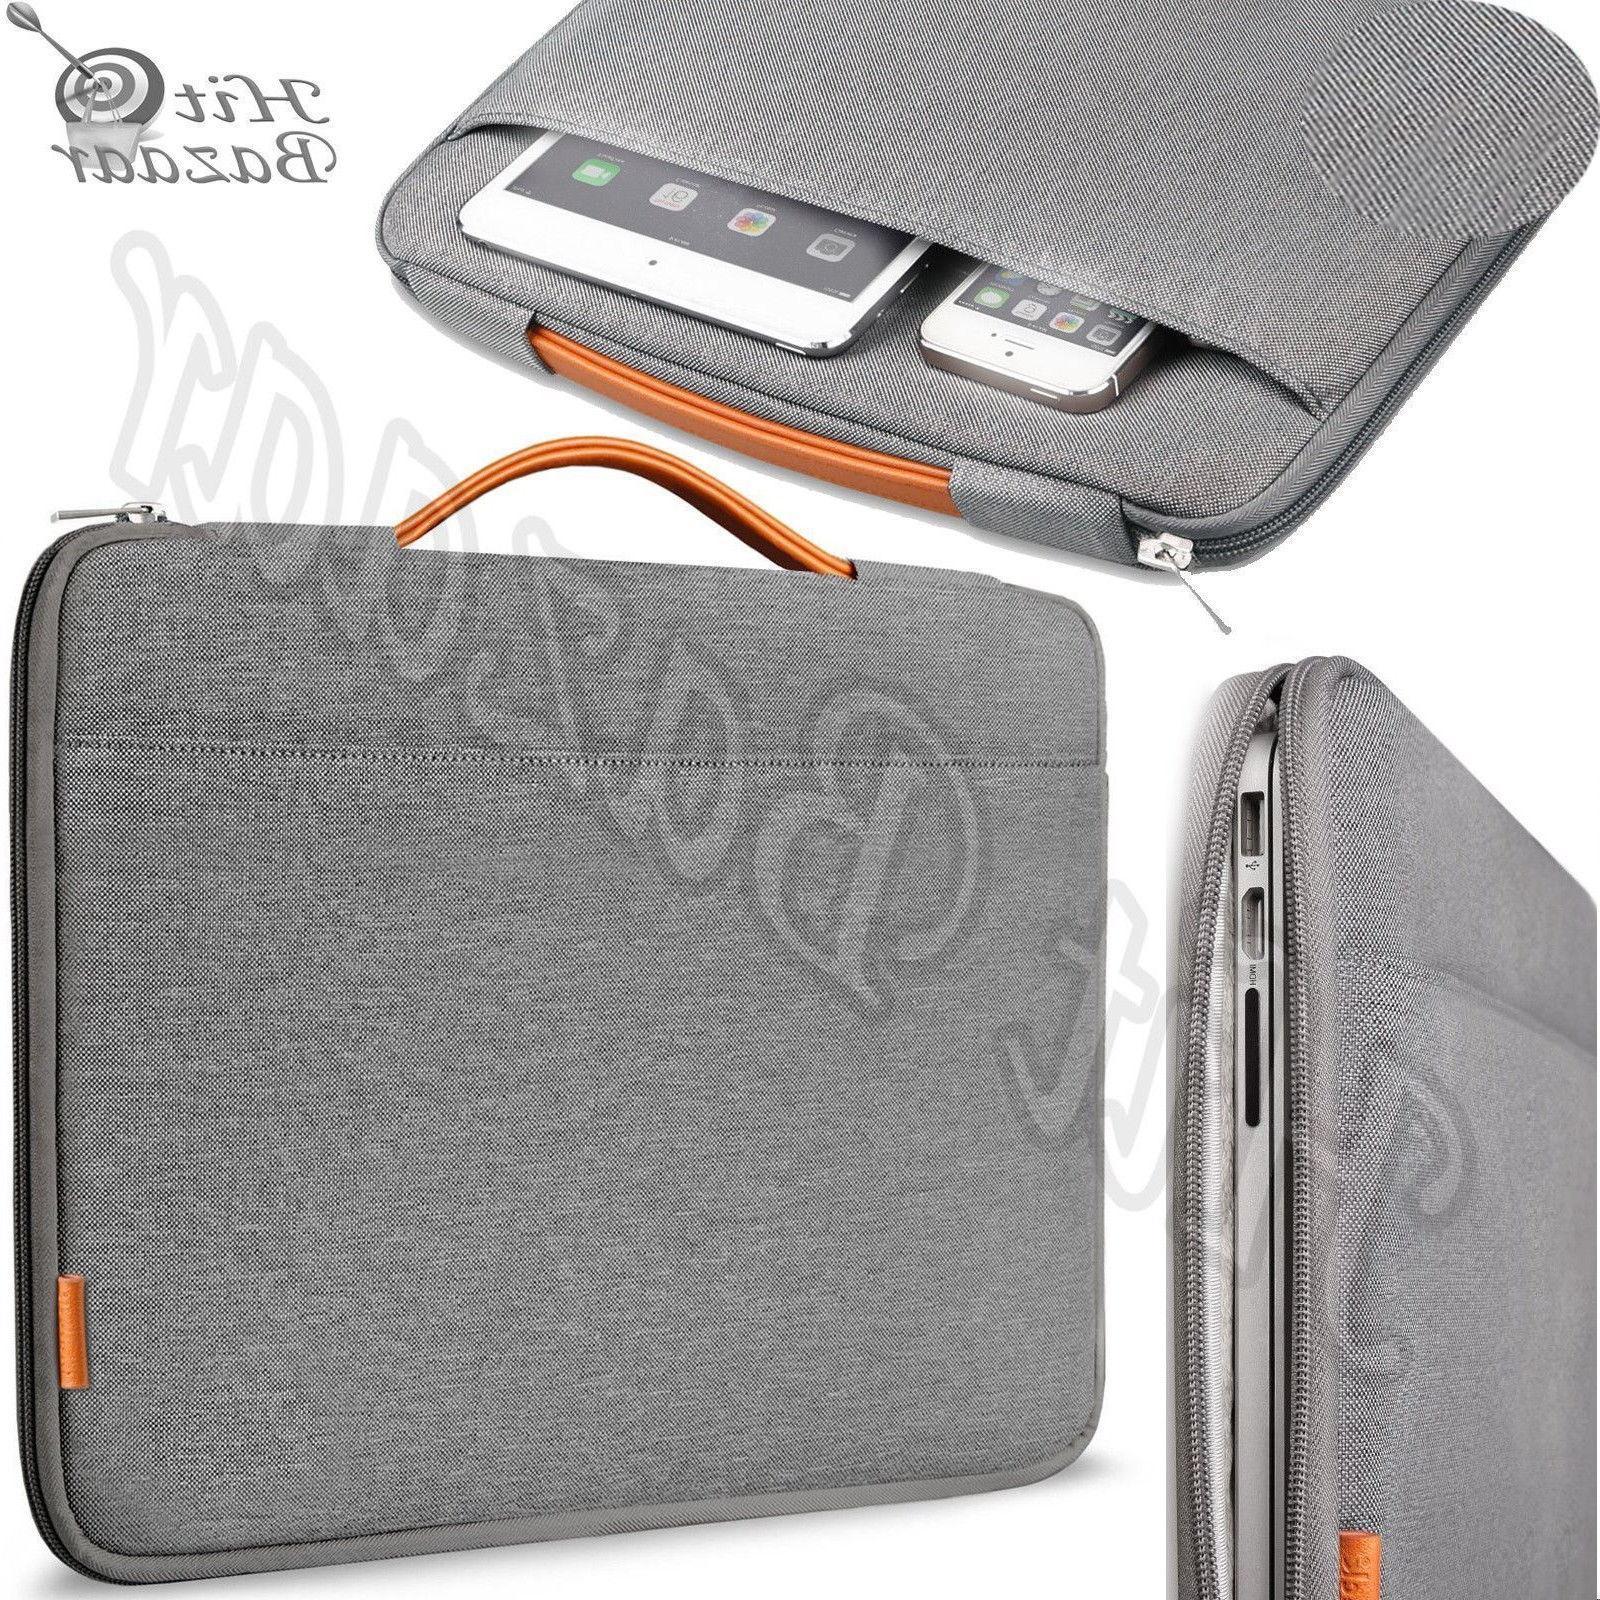 LAPTOP SLEEVE FOR MacBook Pro 2017 Tablet Case Bag Carry Bri